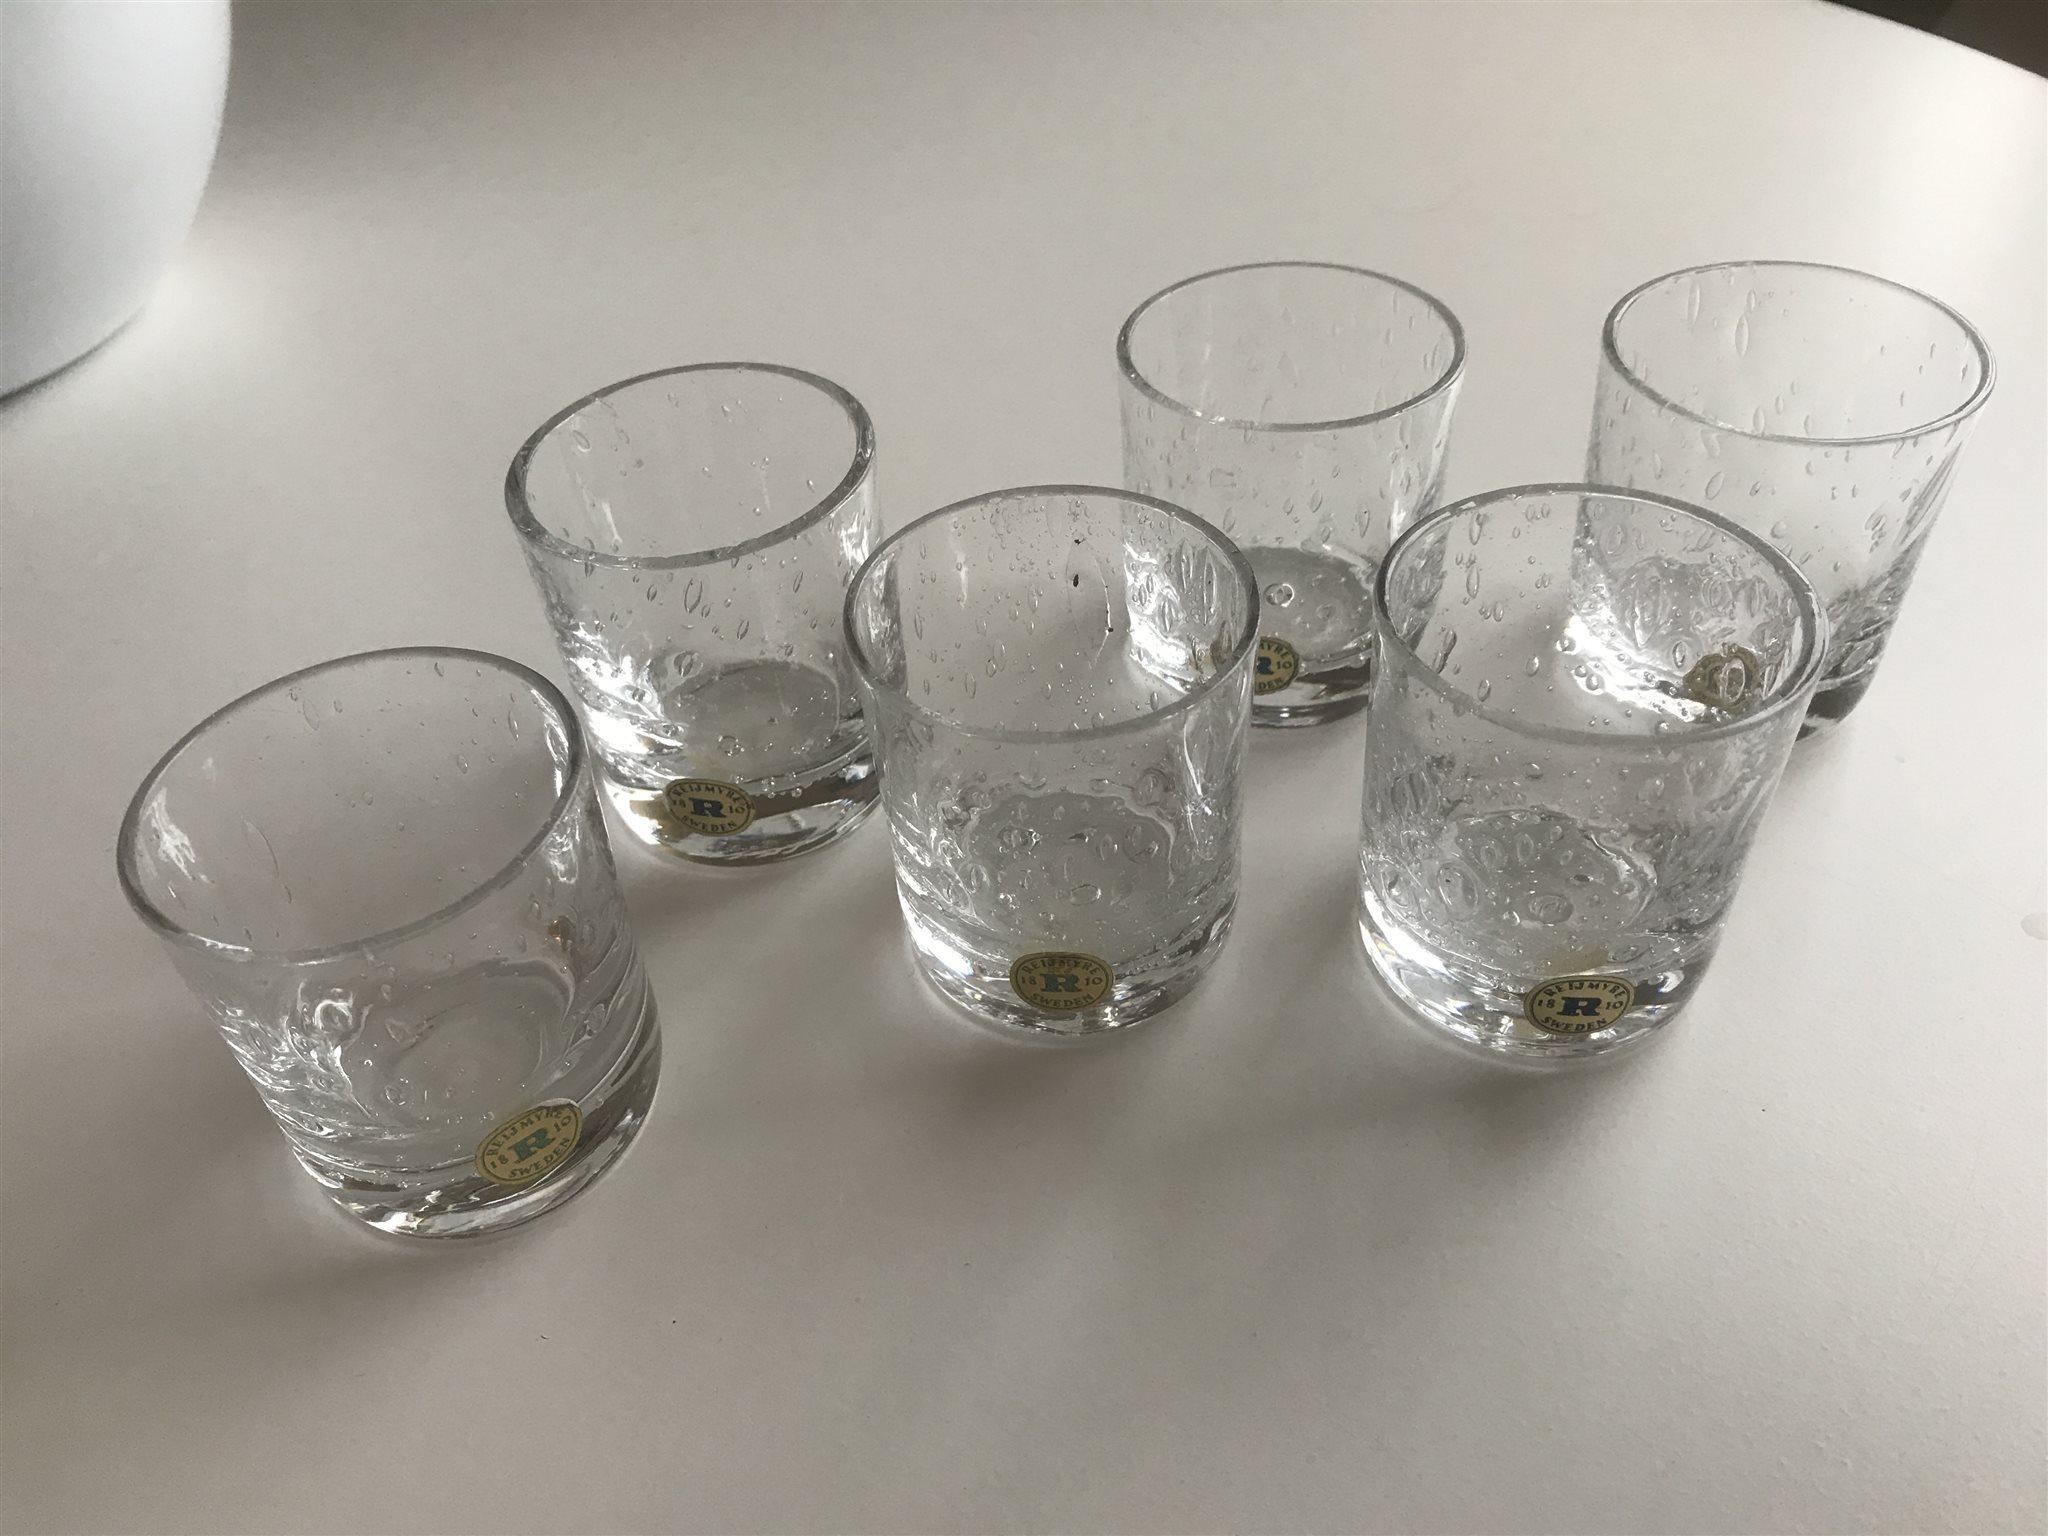 små glas